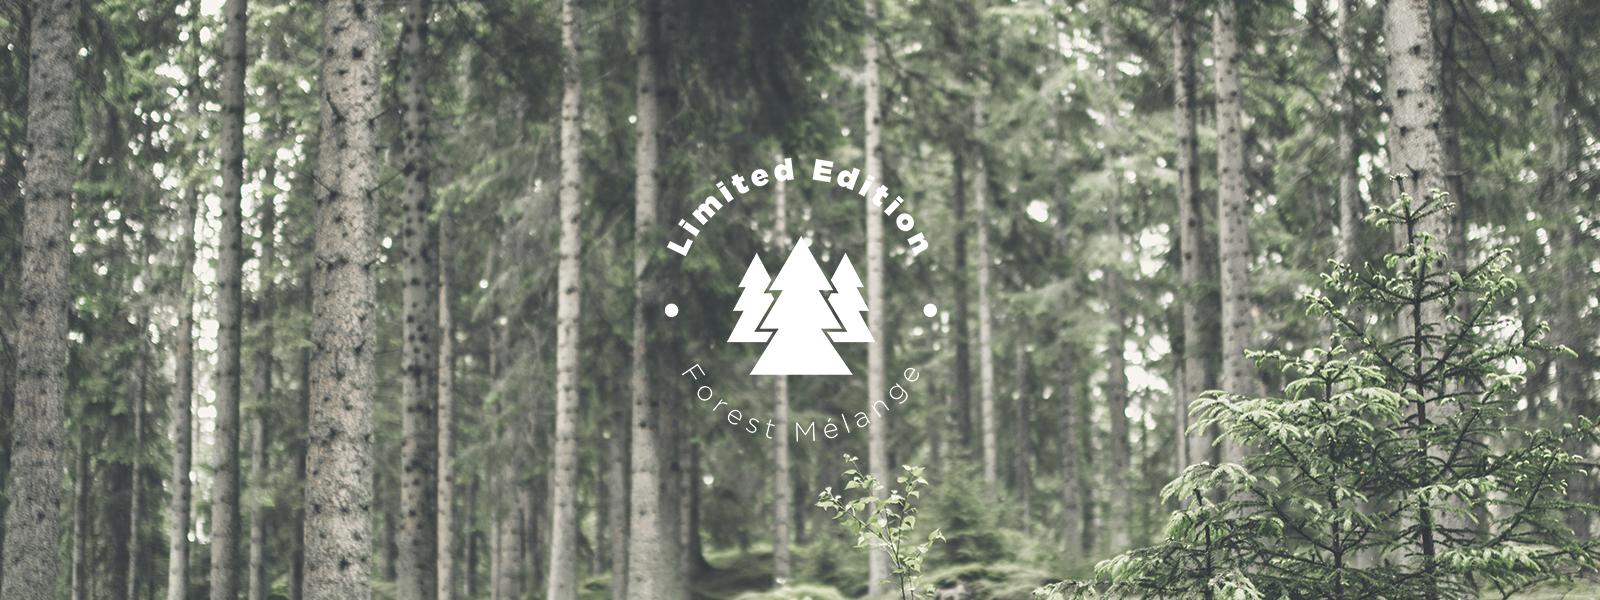 Forest Mélange Limited Edition